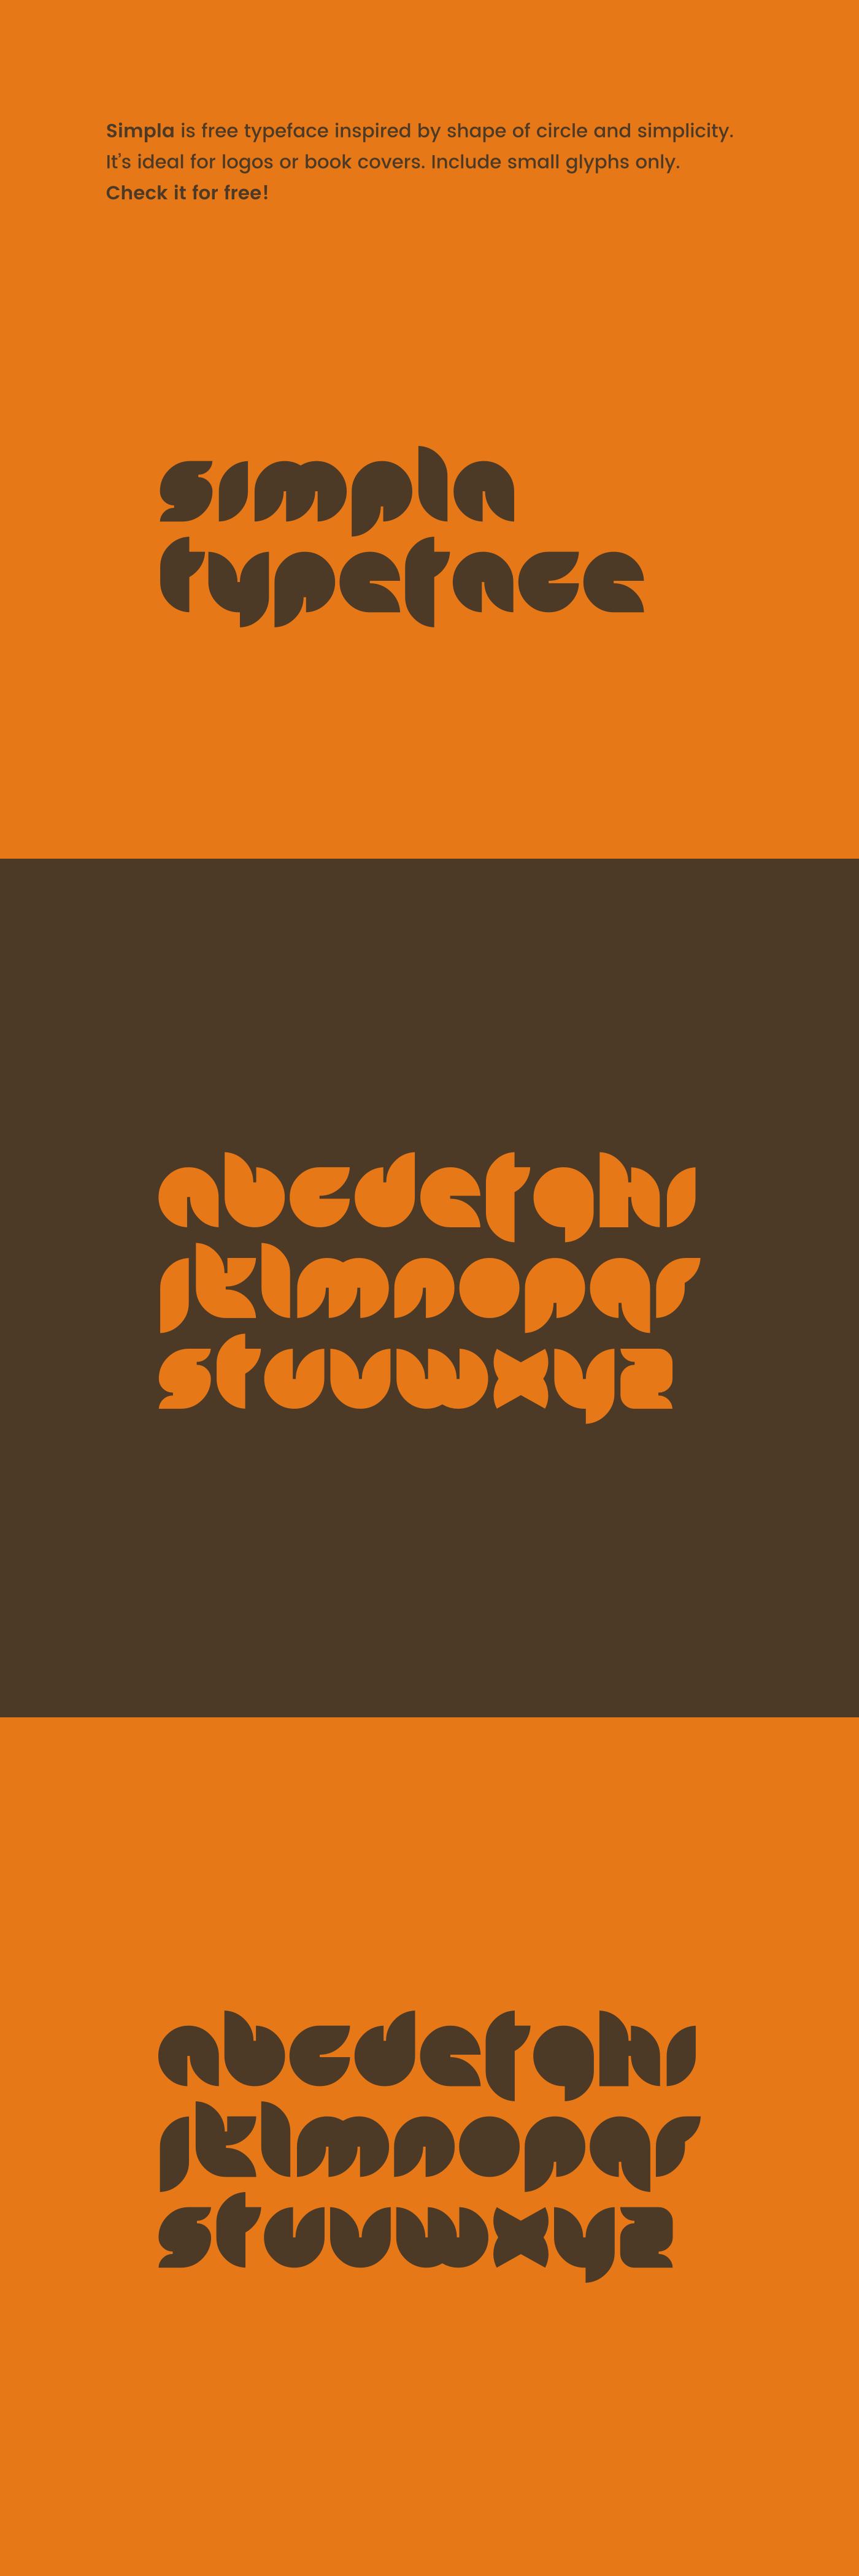 font simpla free typeface letters circles Typeface Free font orange minimal simple